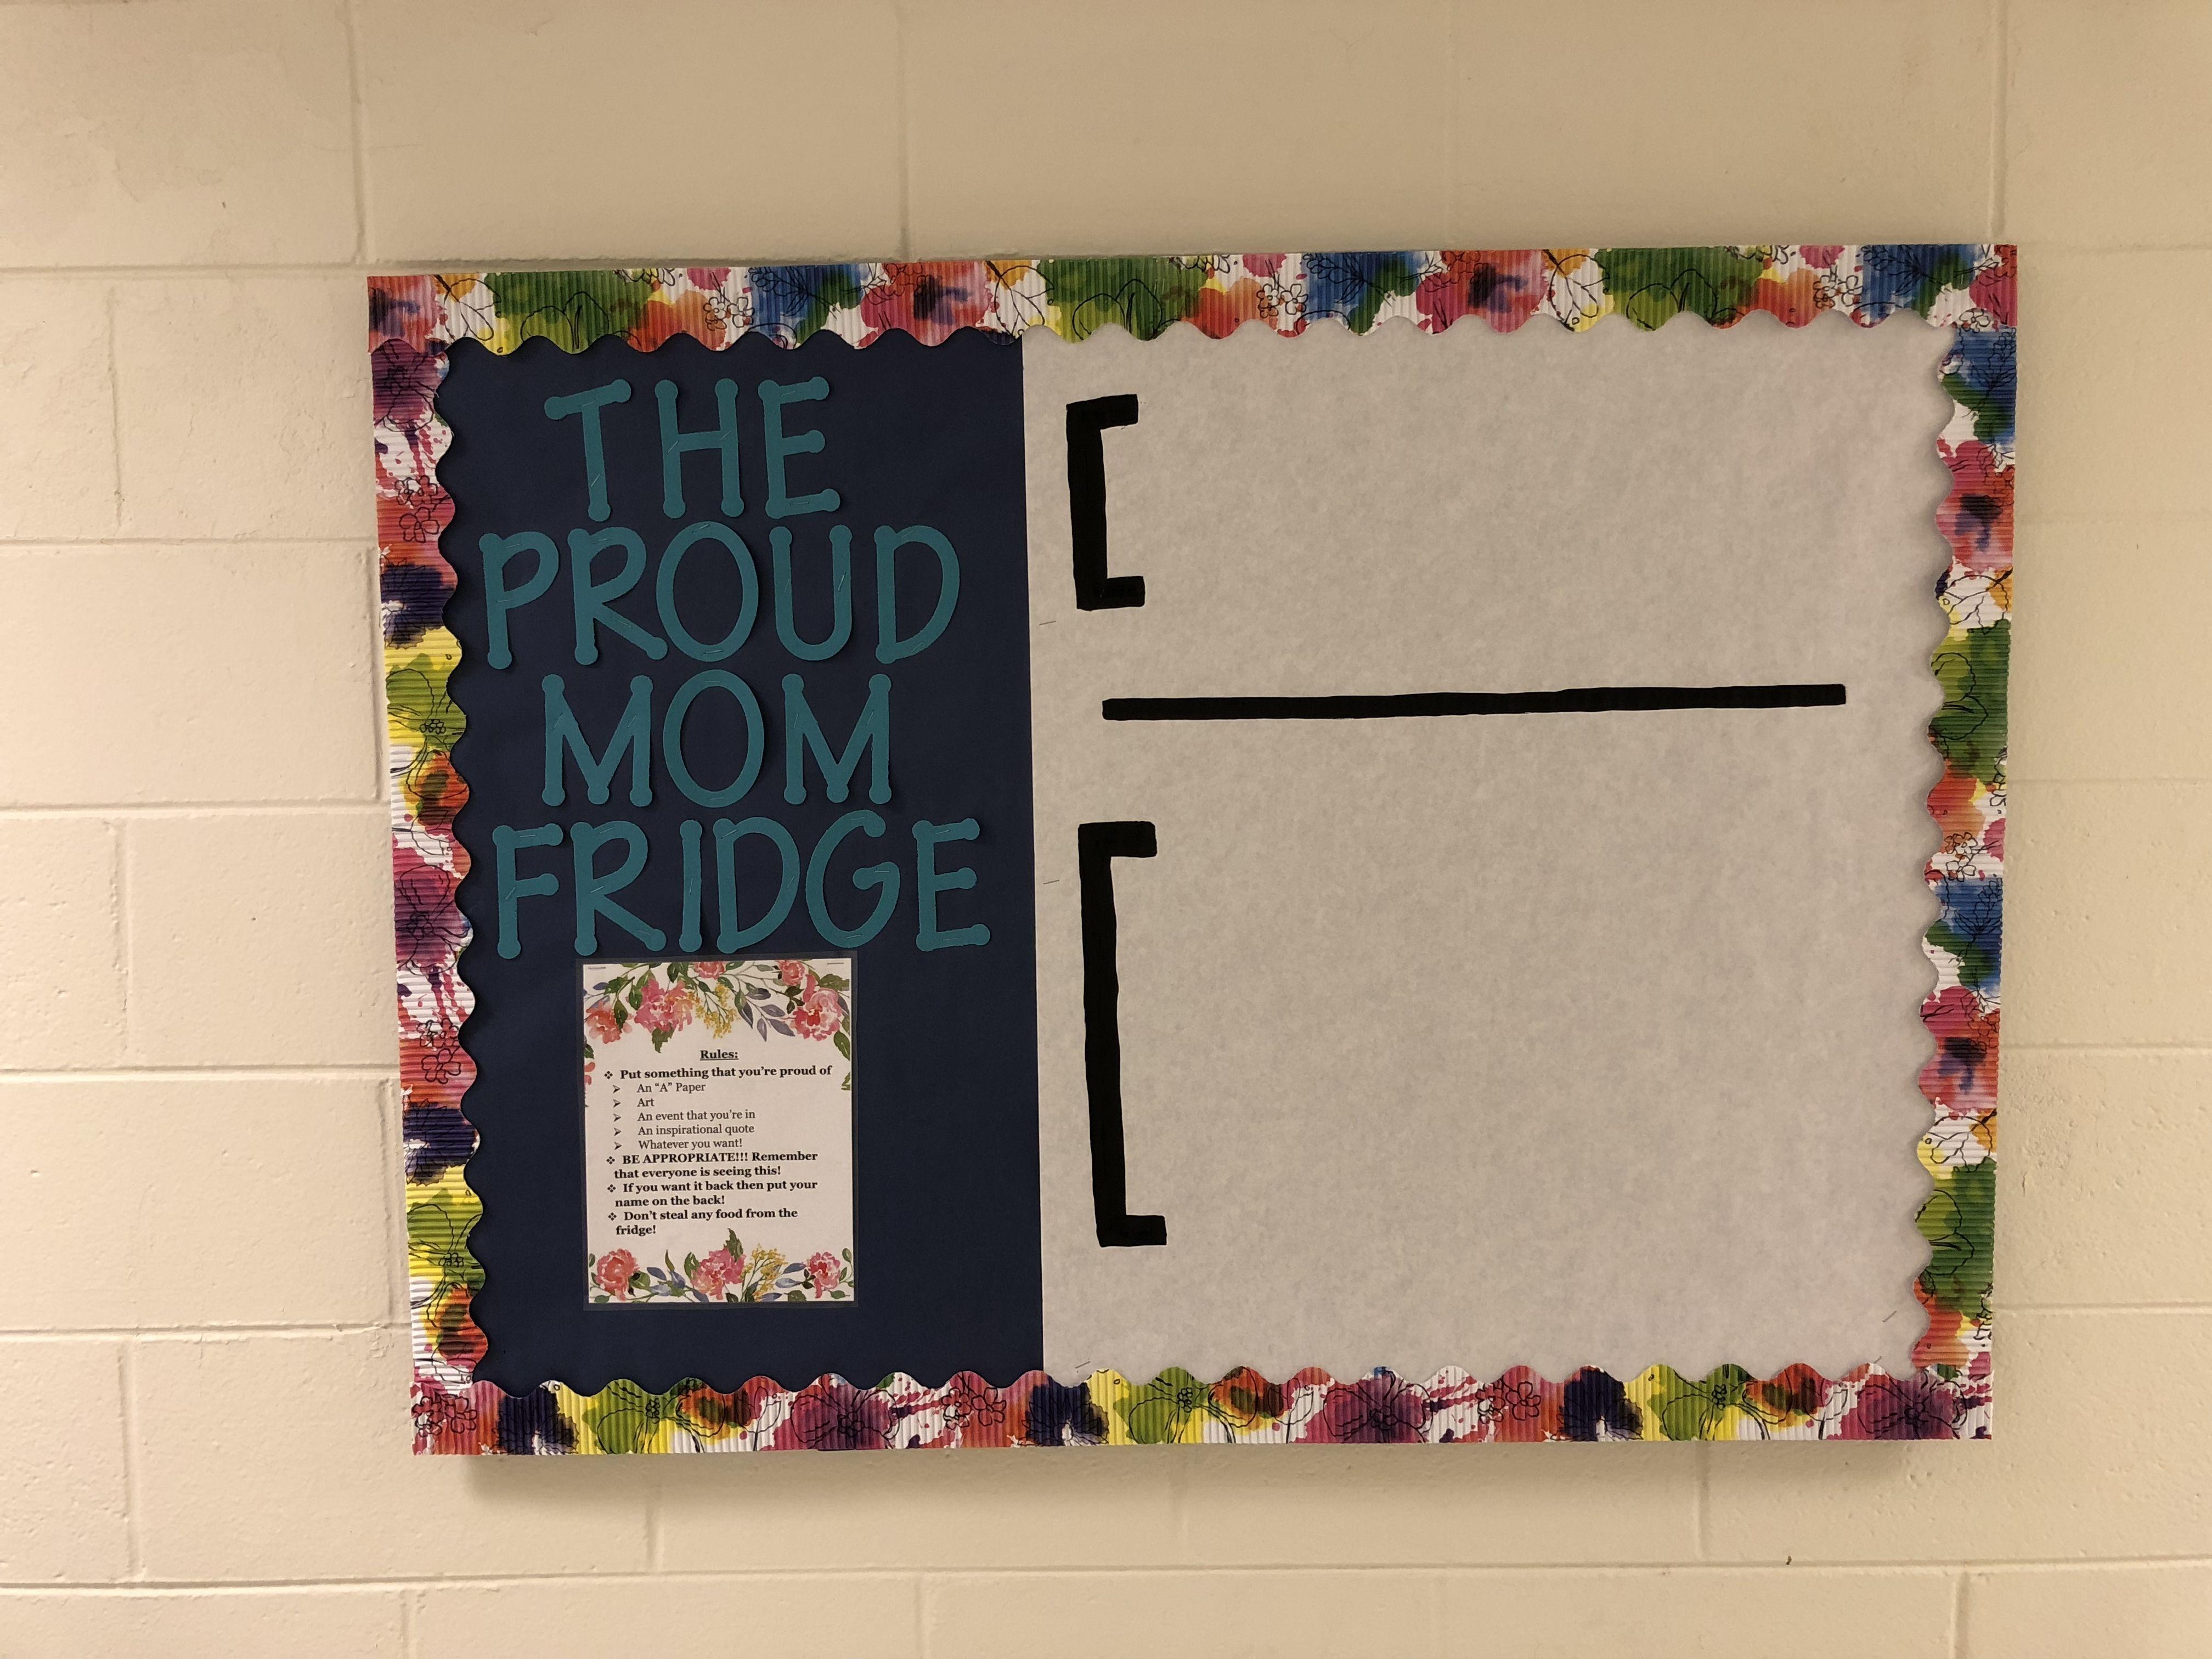 RA Bulletin Board. The Proud Mom Fridge. #rabulletinboards RA Bulletin Board. The Proud Mom Fridge. #rabulletinboards RA Bulletin Board. The Proud Mom Fridge. #rabulletinboards RA Bulletin Board. The Proud Mom Fridge. #octoberbulletinboards